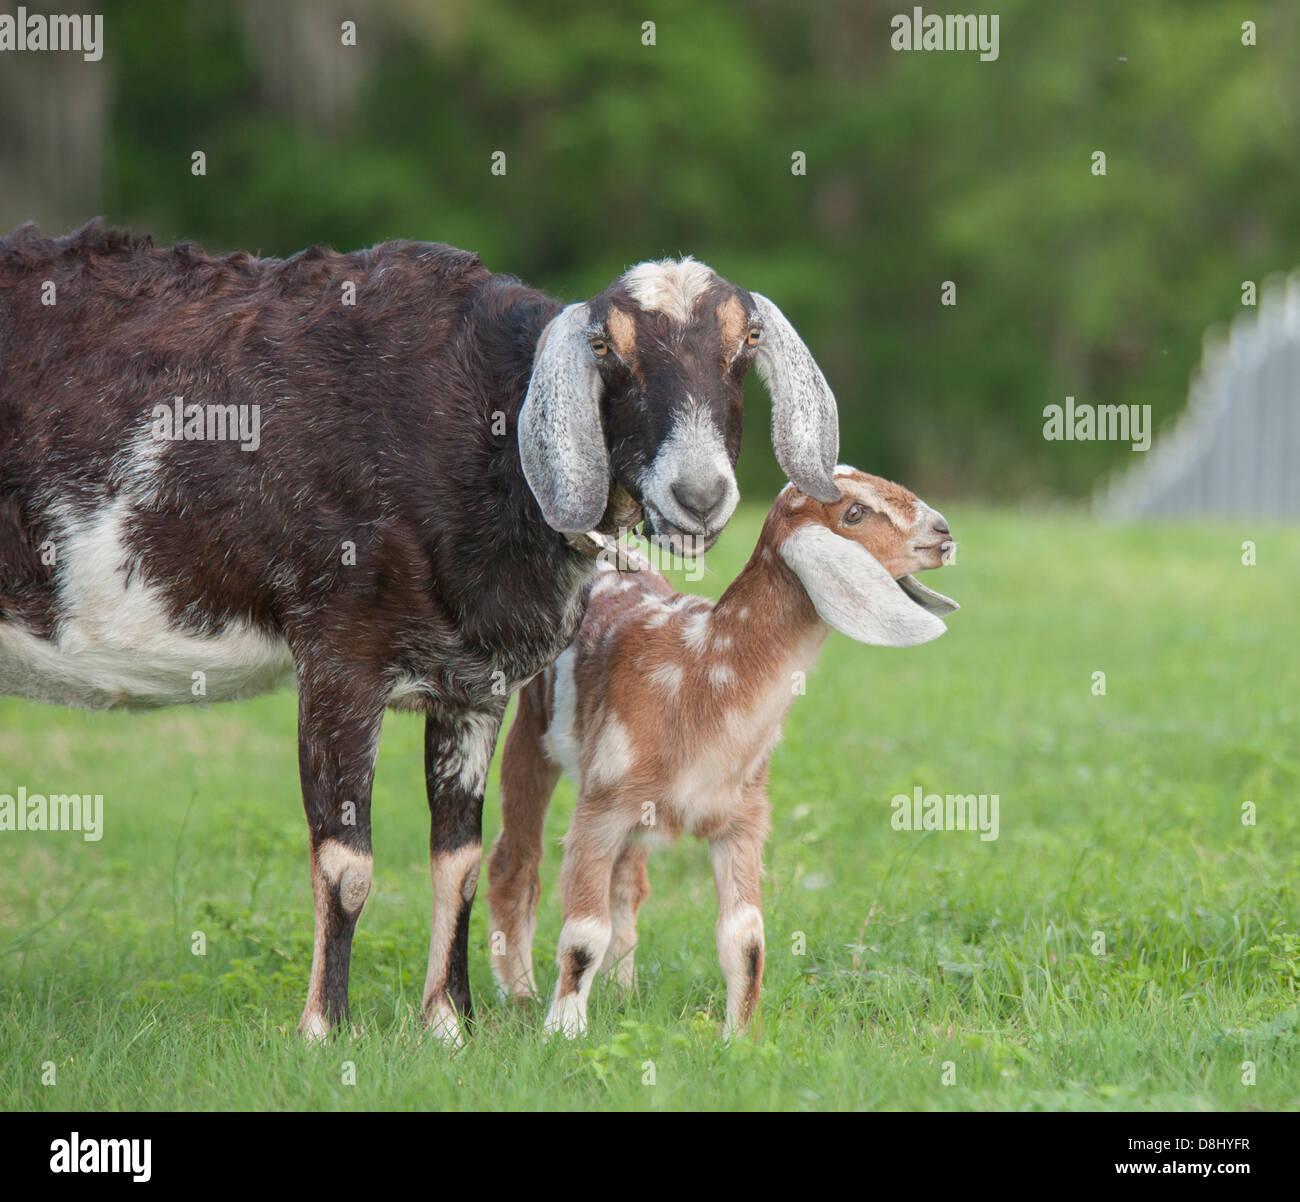 Nubian goat kid and nanny - Stock Image